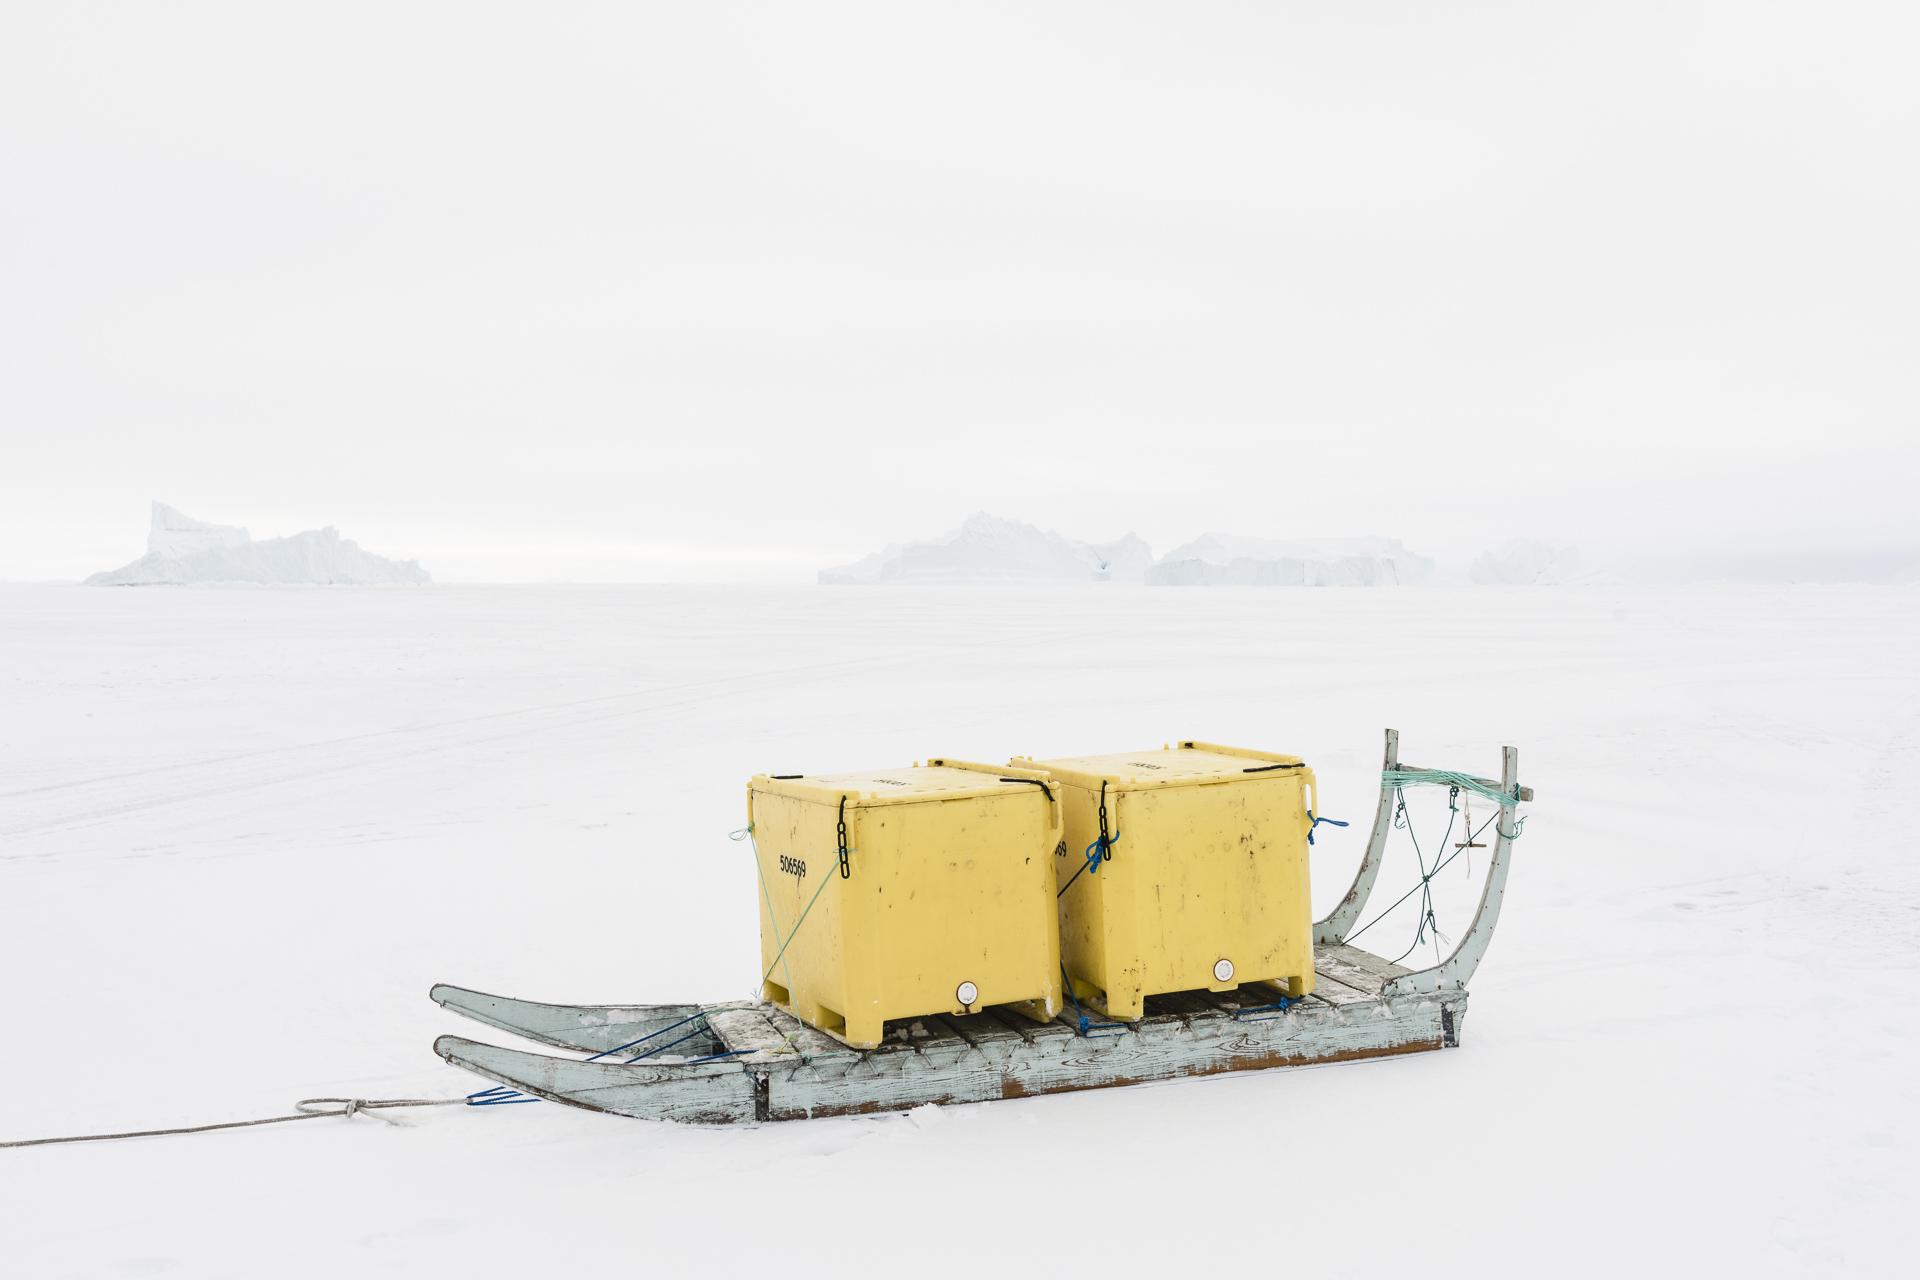 3.Defibaugh_Greenland_Uummannaq_a_110.jpg